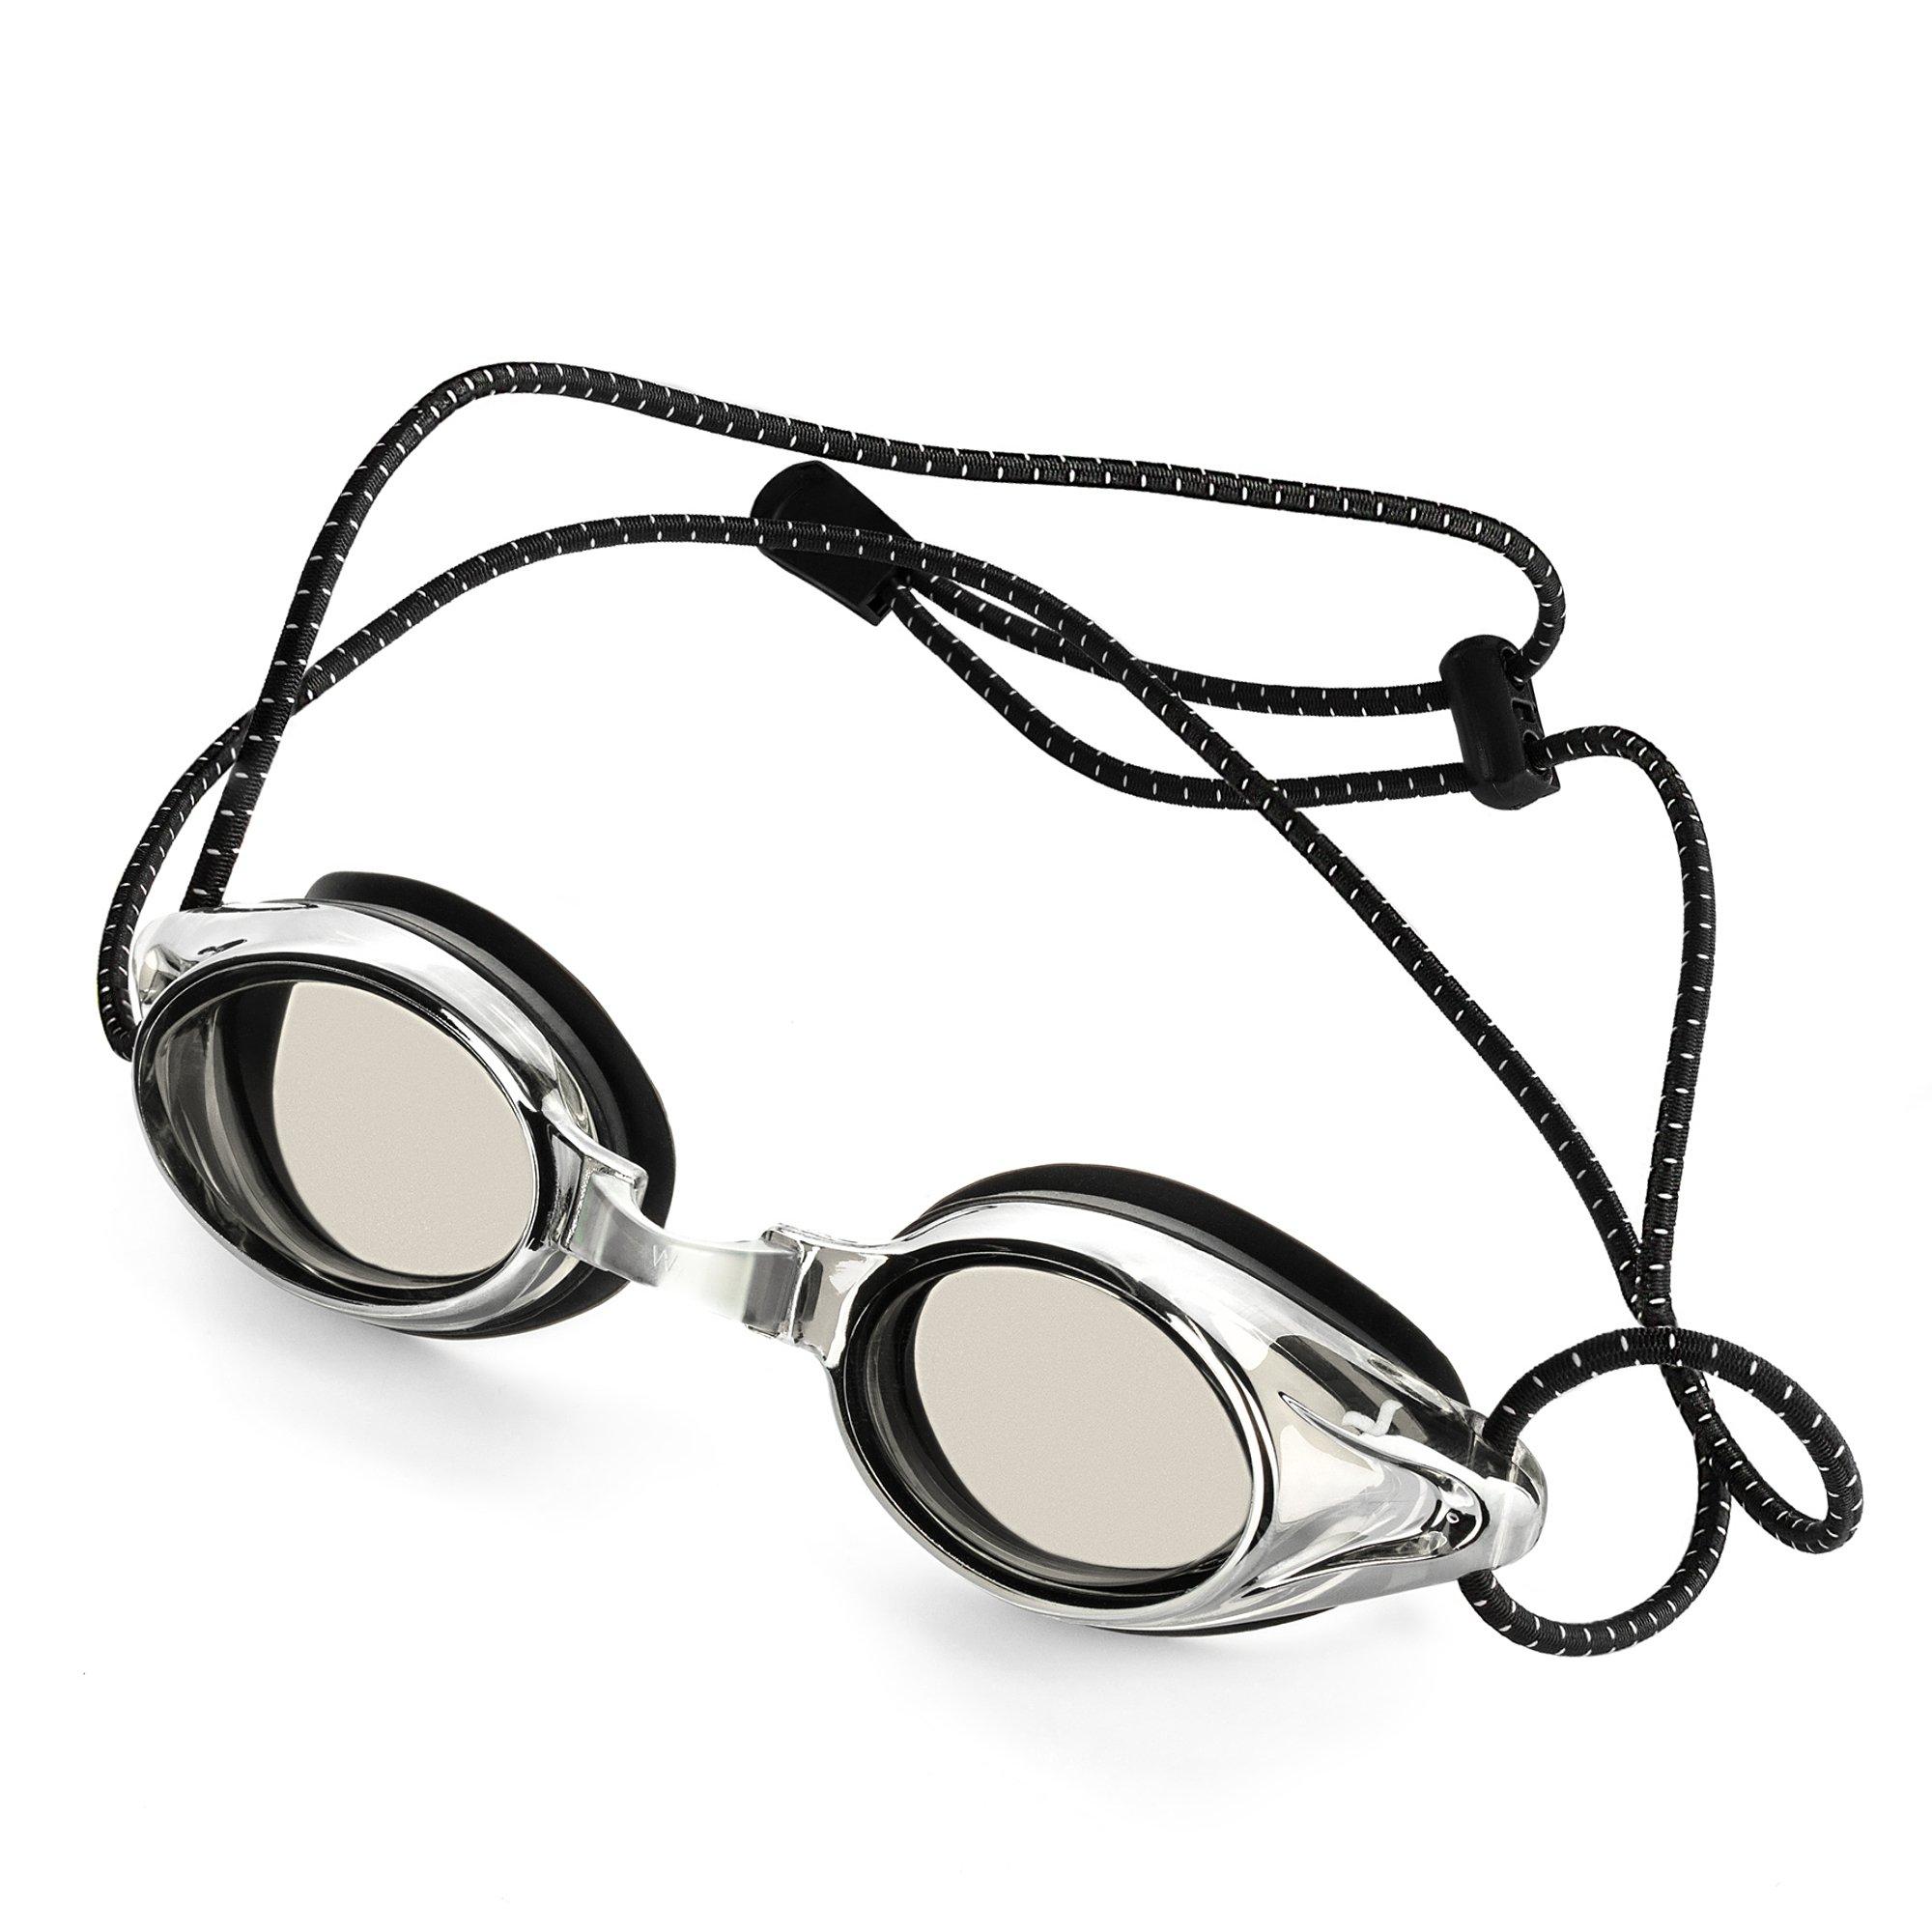 Proswims Anti-Fog Racing Swimming Goggles Gray Lens